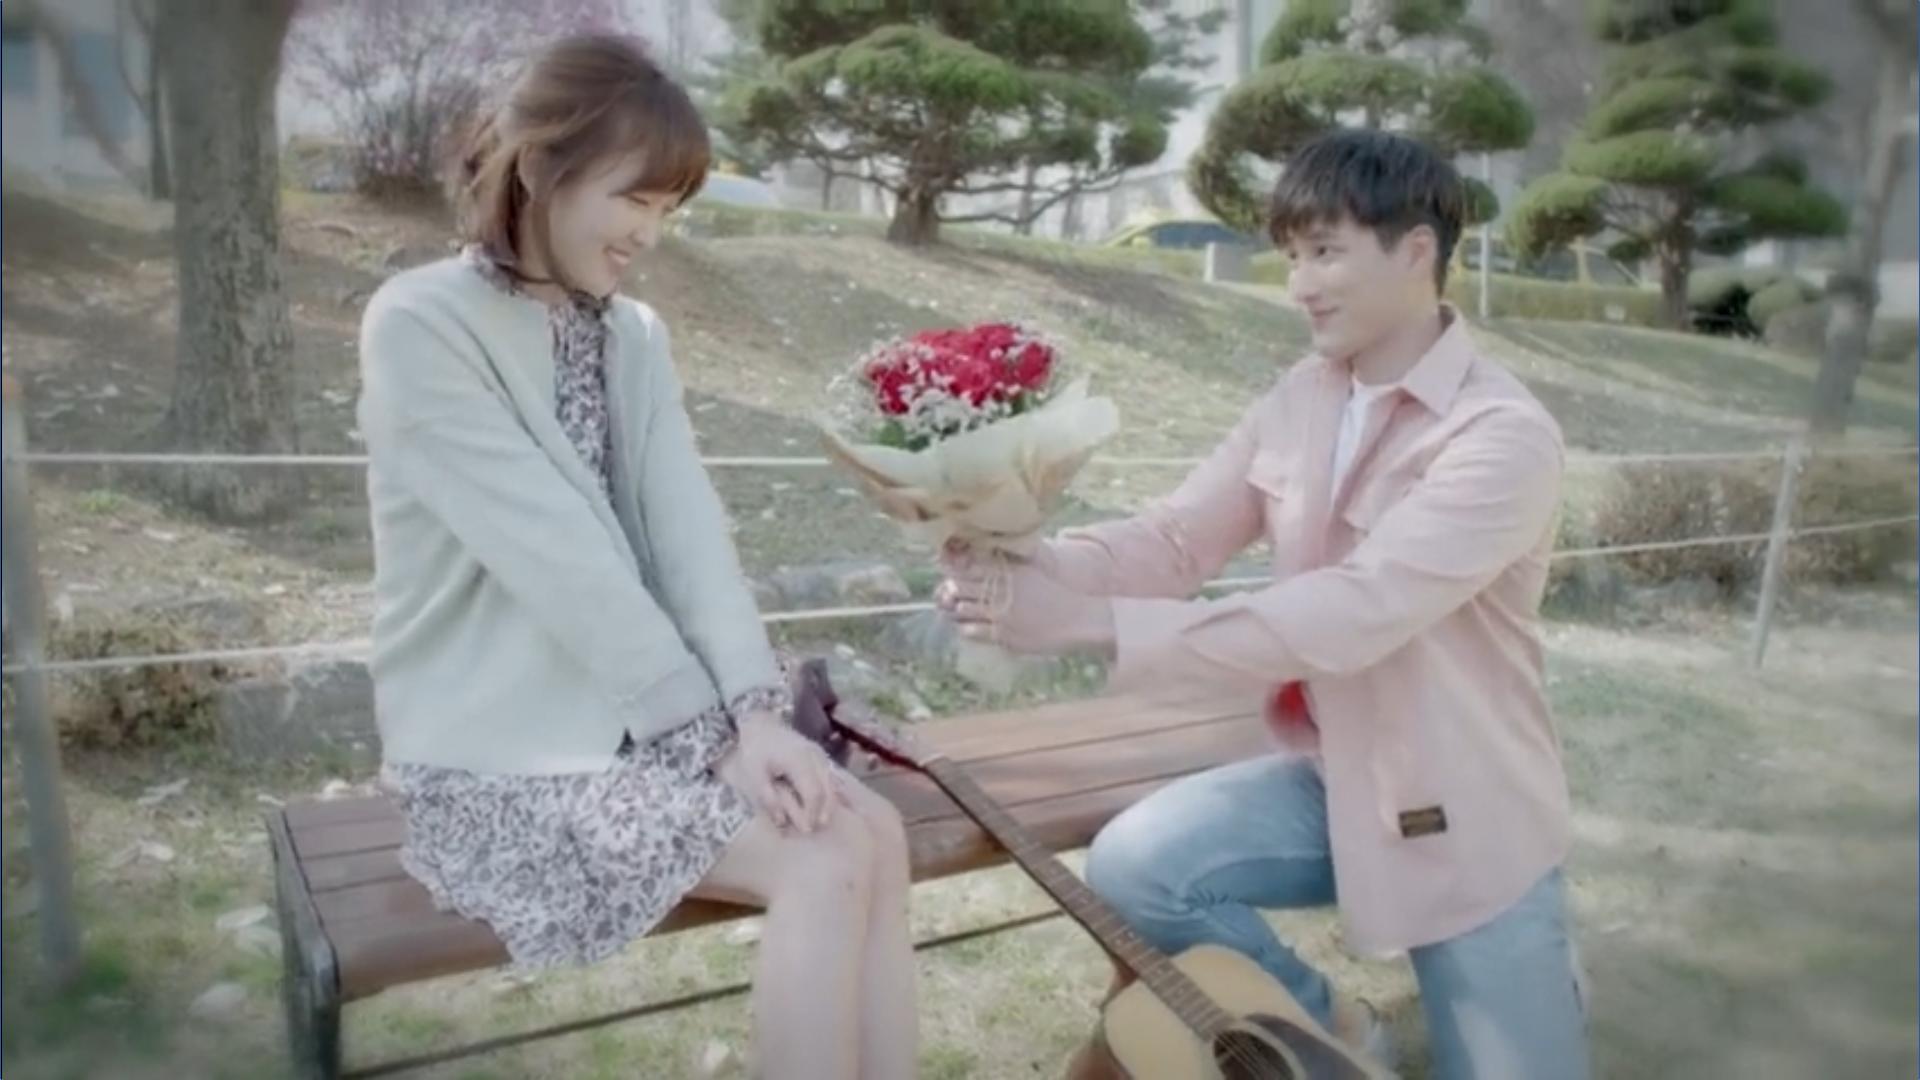 Wednesday 3:30 PM Baek Seung-gyu giving Seon Eun-woo flowers